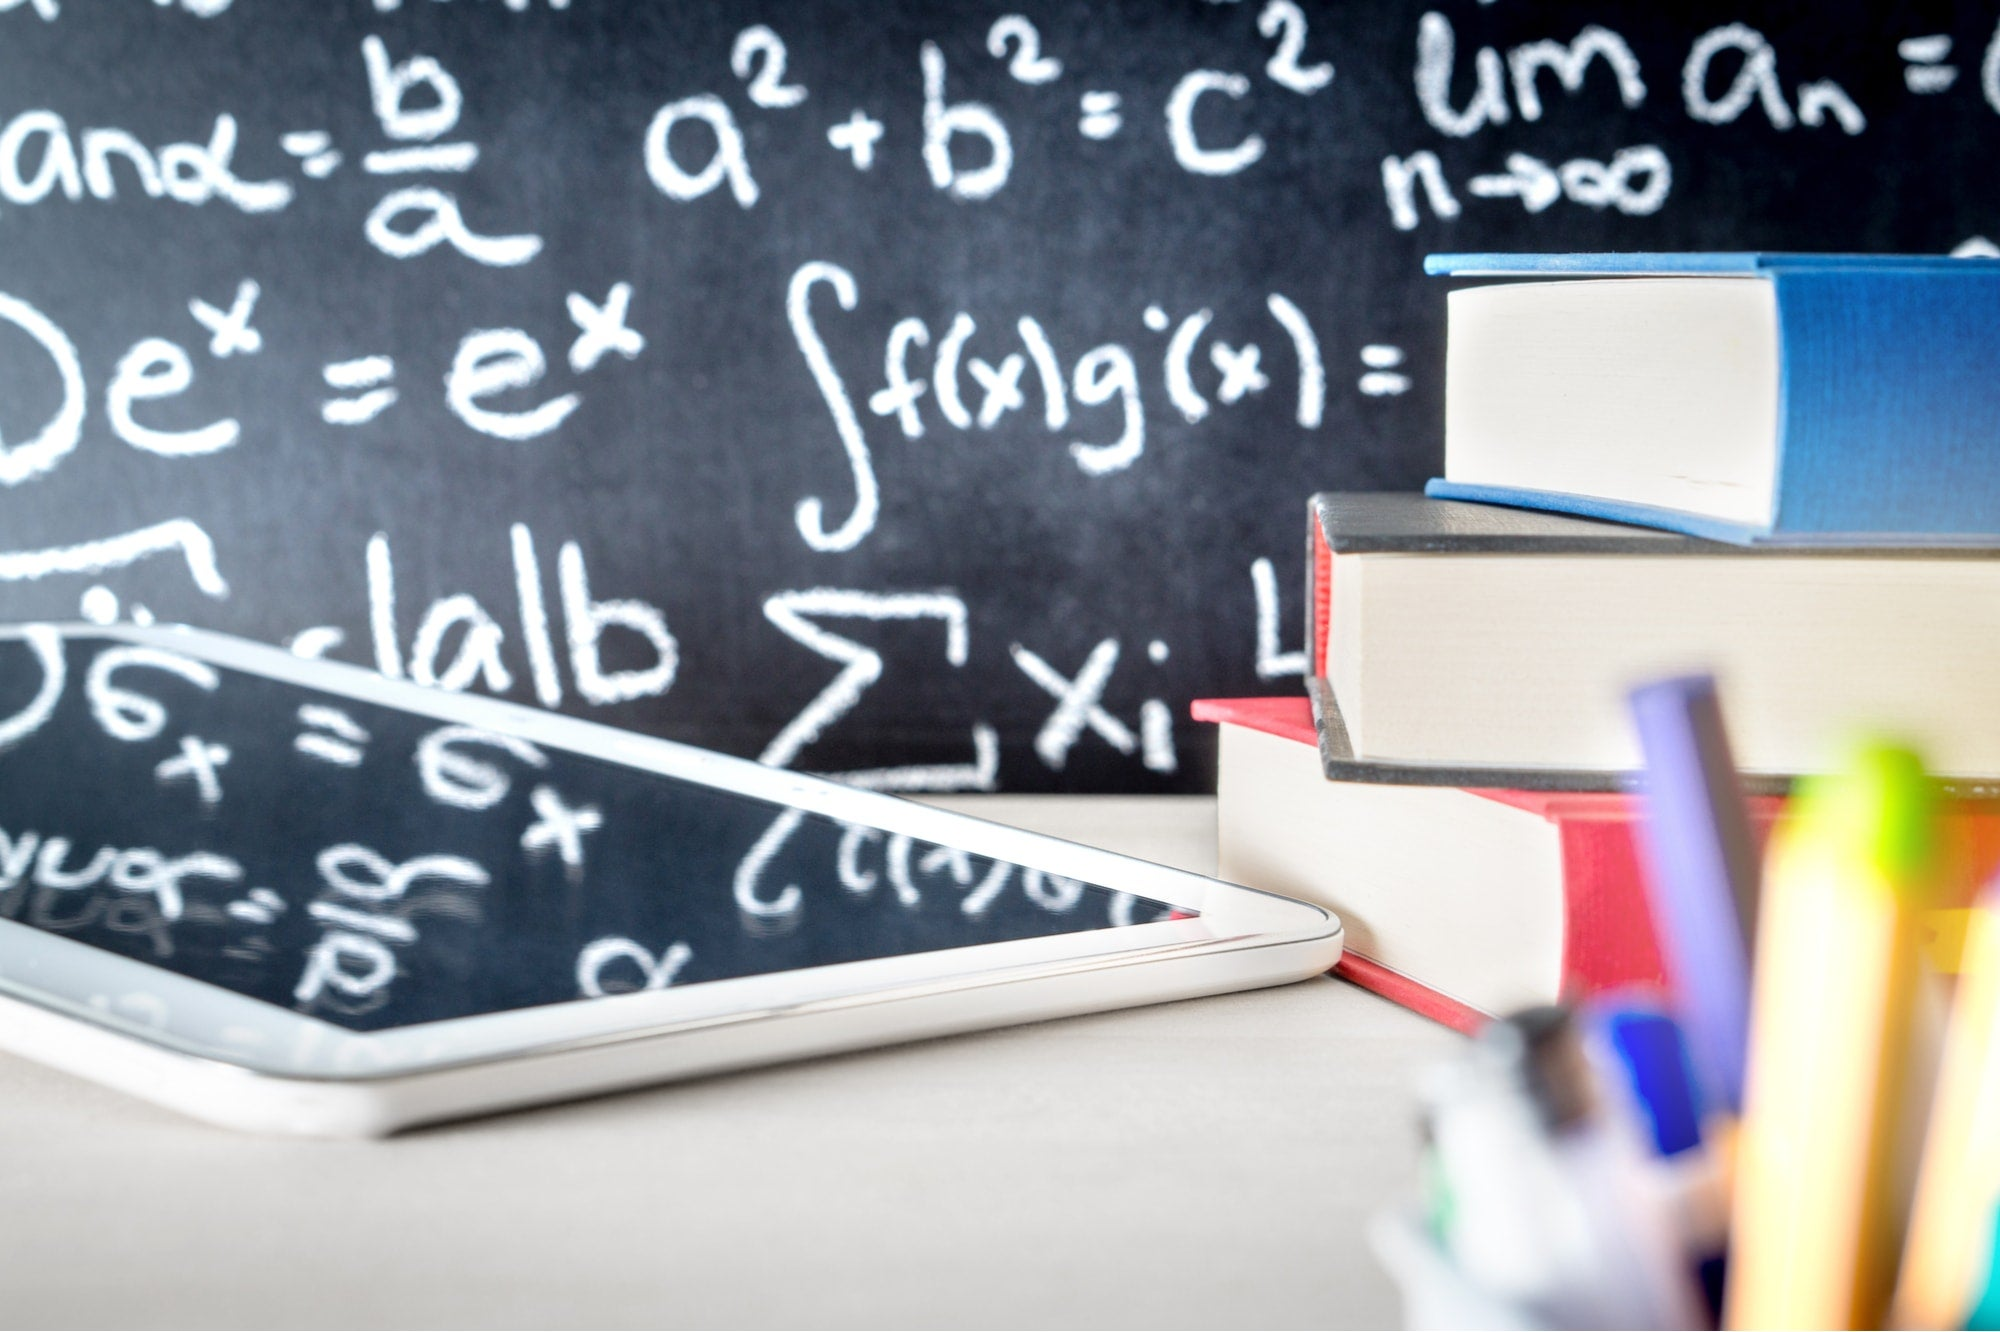 aprendizaje matematica tecnologia America Latina Caribe COVID-19-min